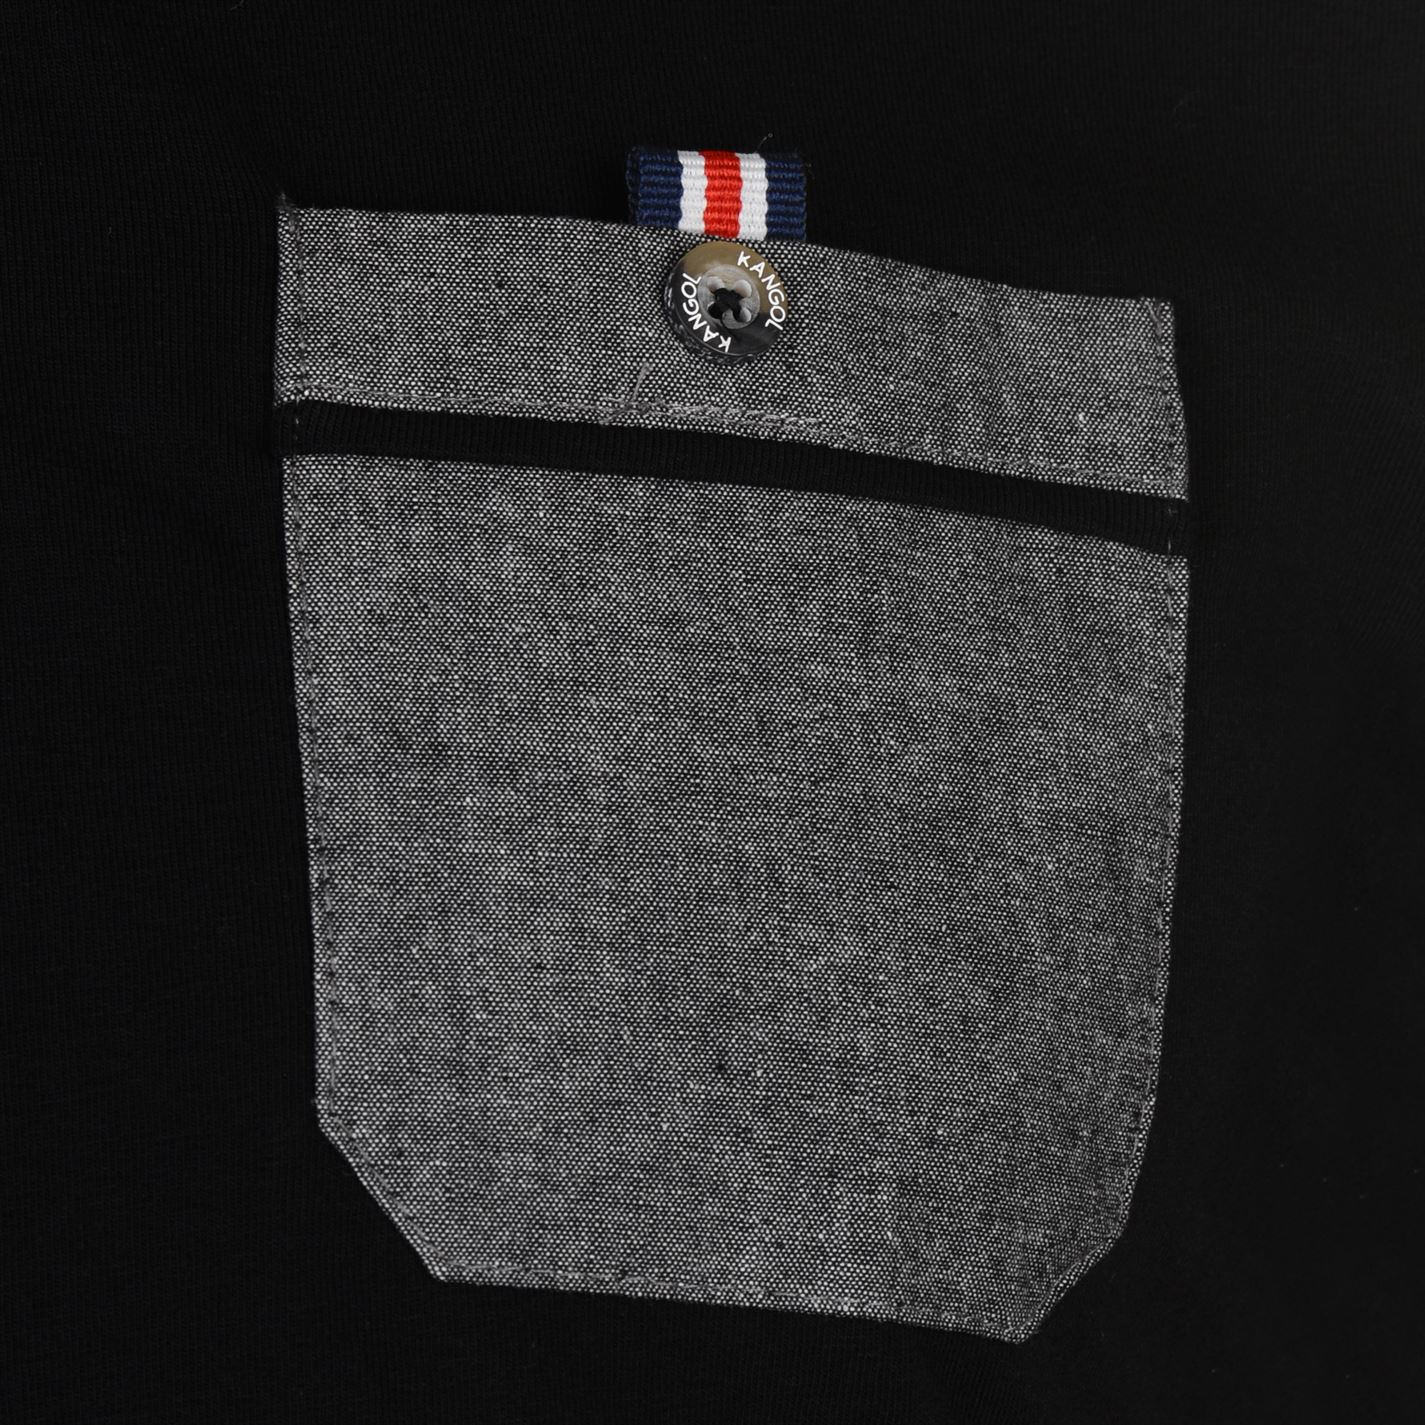 Kangol-Mens-Cham-Short-Sleeve-Polo-Shirt-Classic-Fit-Tee-Top-Lightweight-Colour thumbnail 6